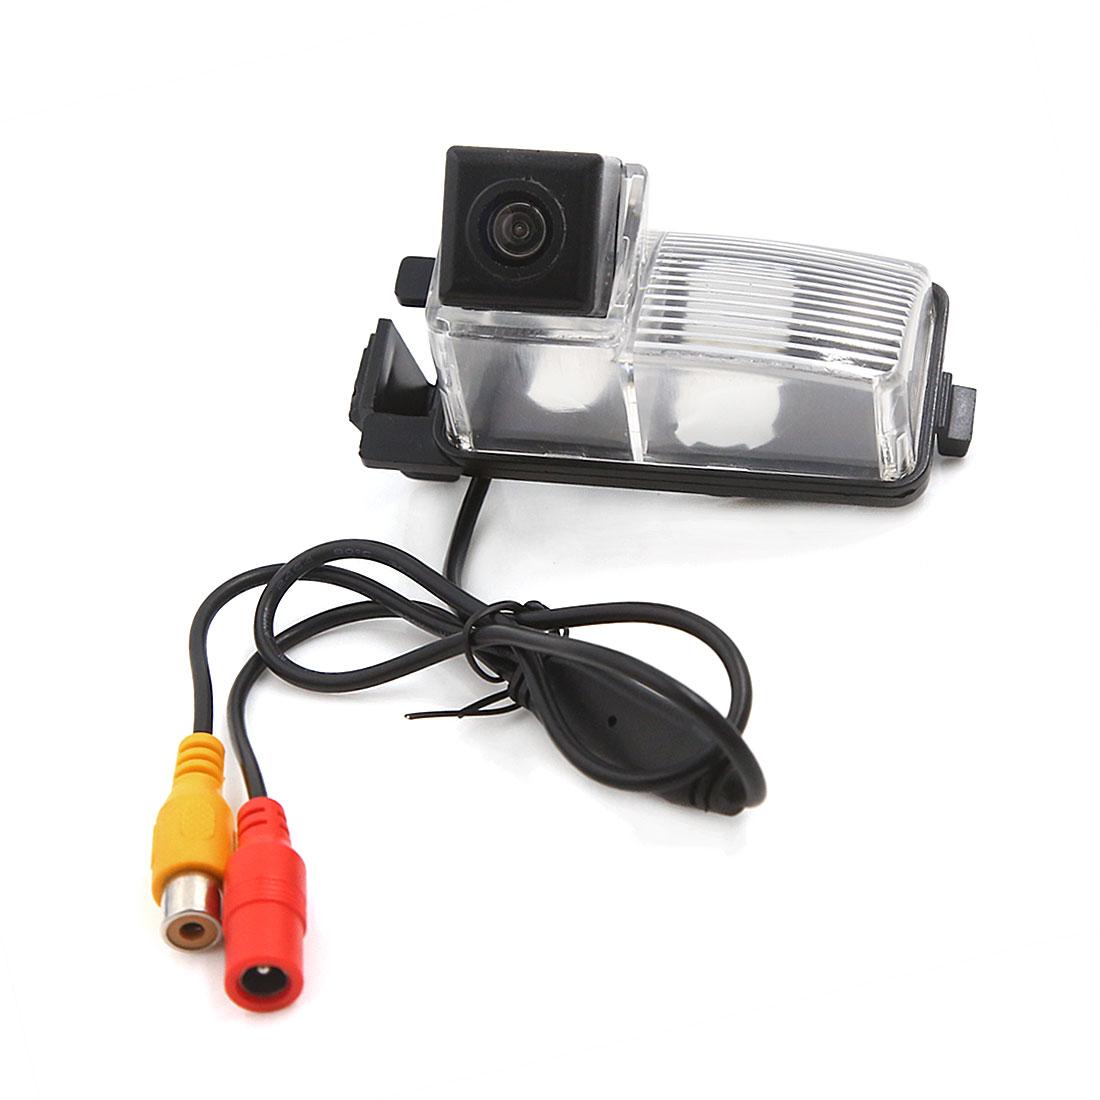 Waterproof 170 Degree Rear View Reversing Parking Camera for Nissan Livina Tiida